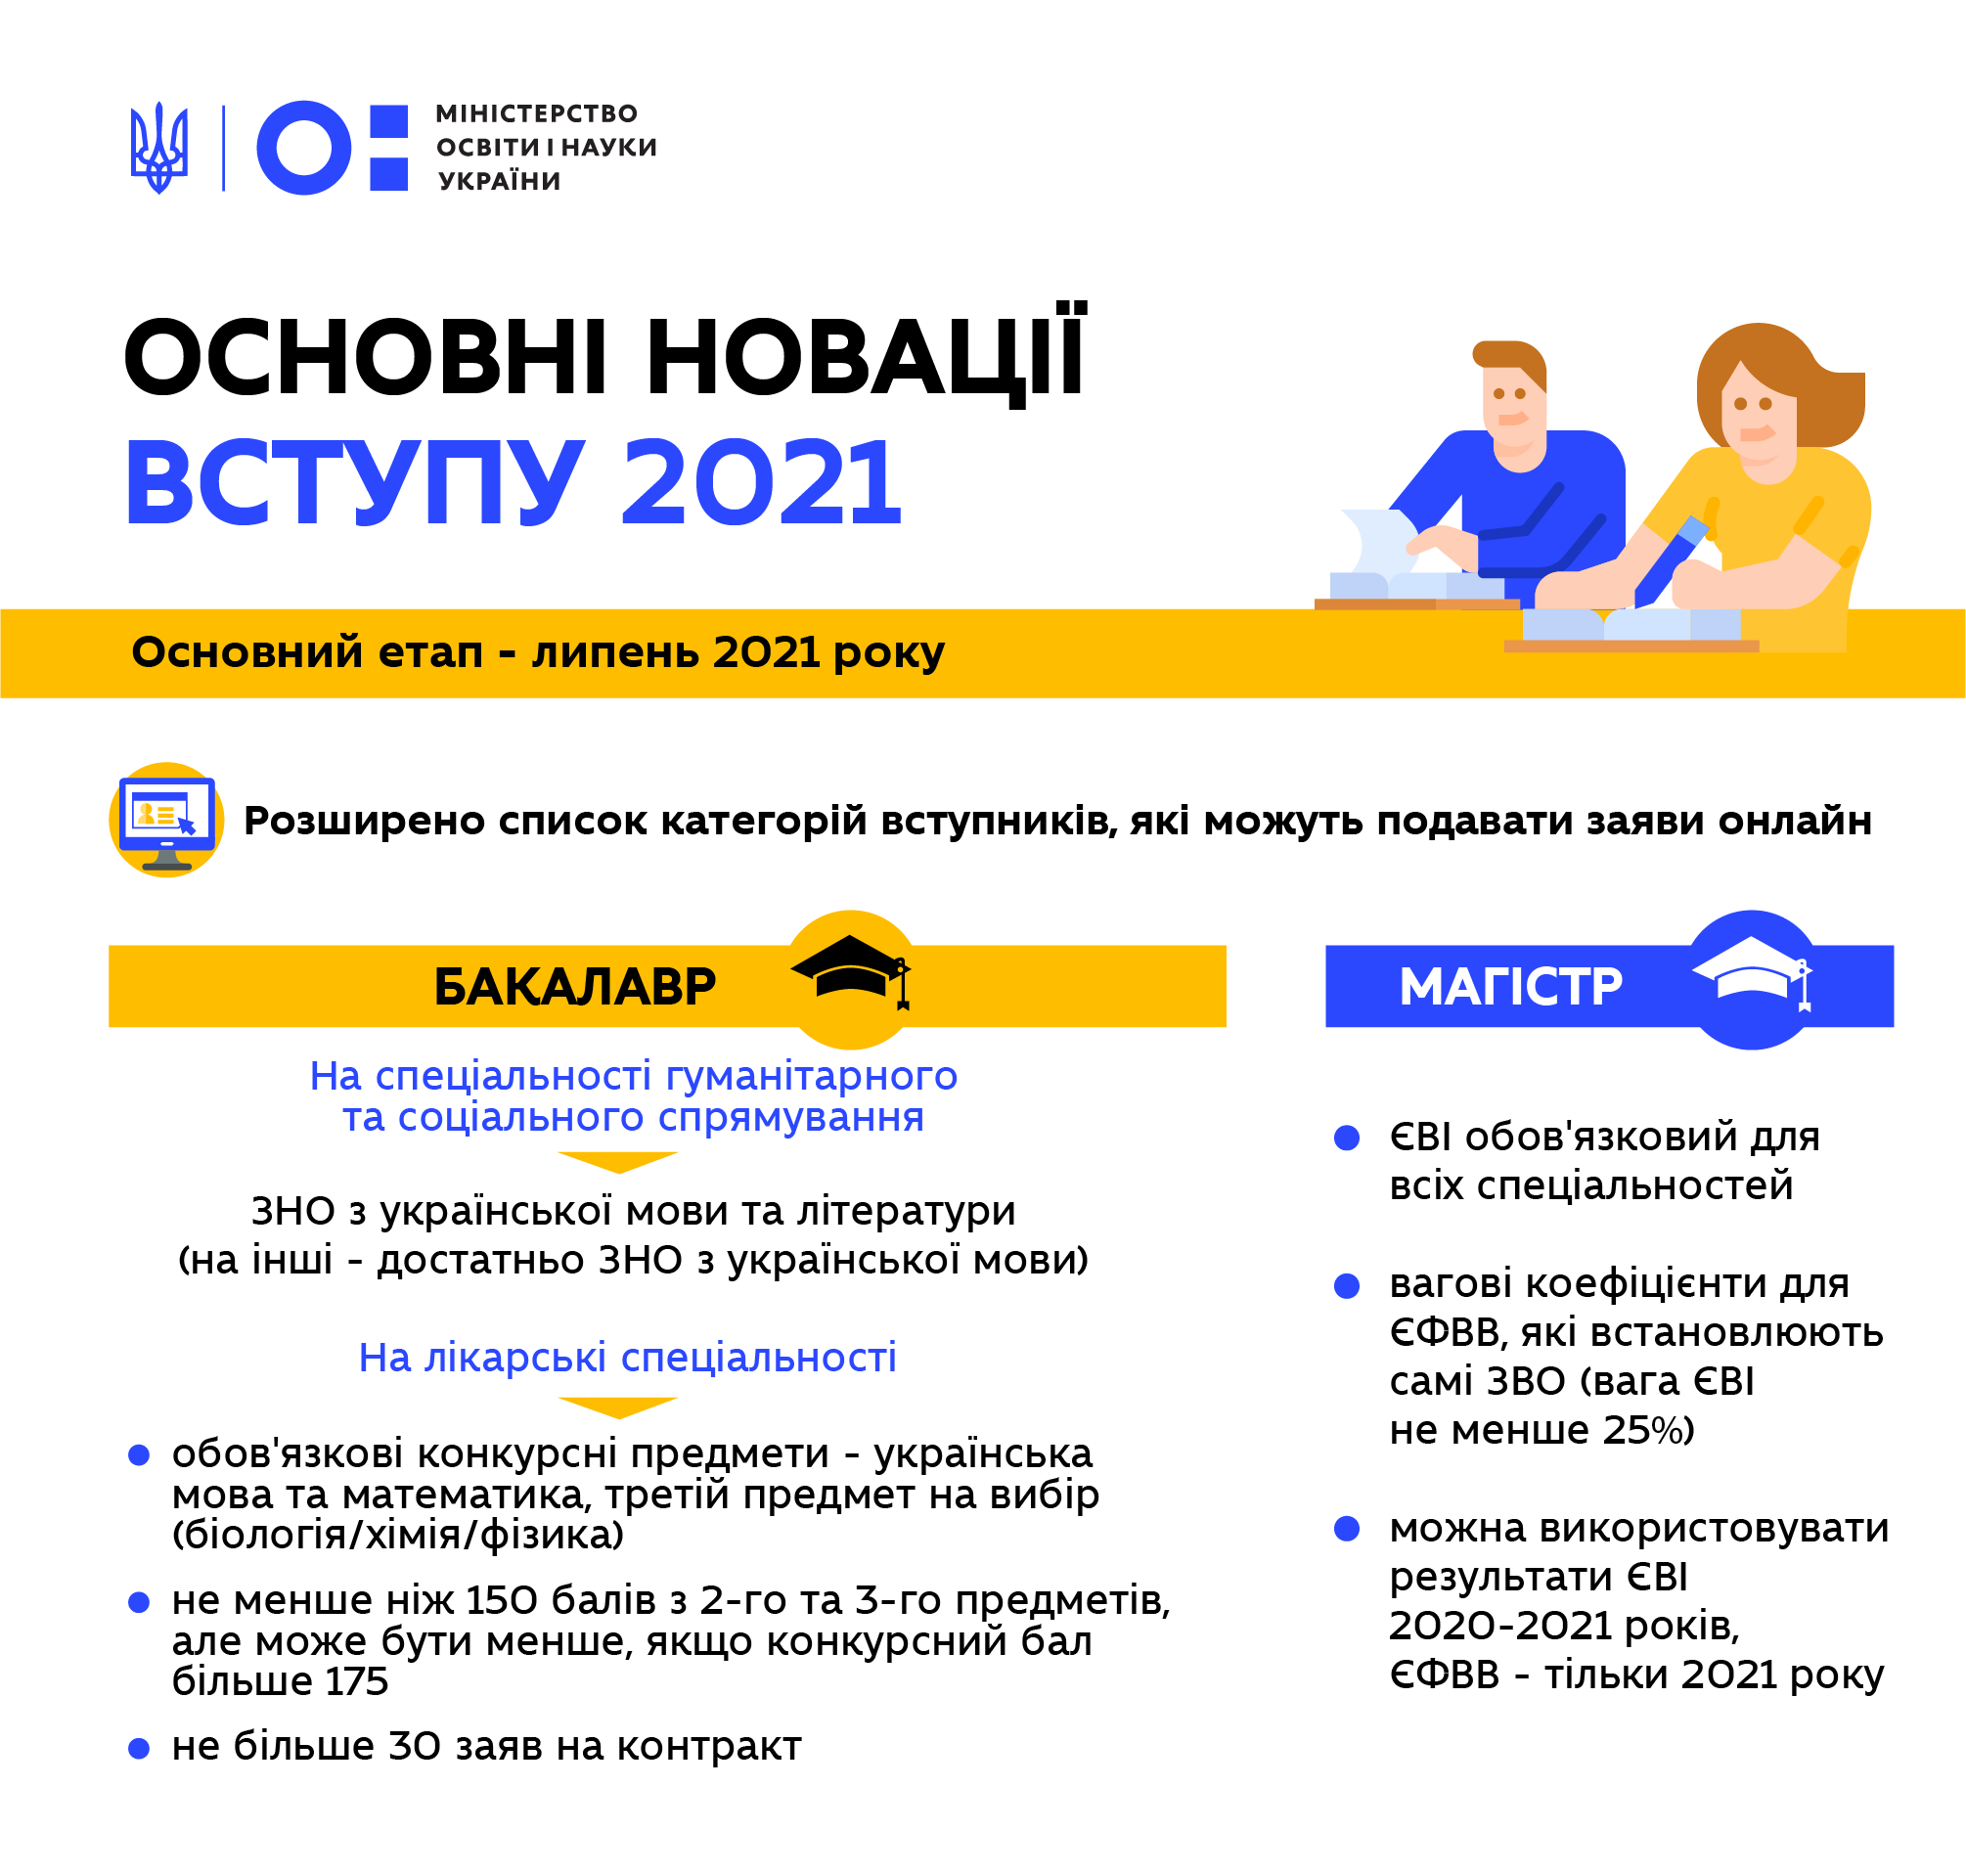 https://mon.gov.ua/storage/app/uploads/public/5f8/869/0f2/5f88690f2c93c987726429.png